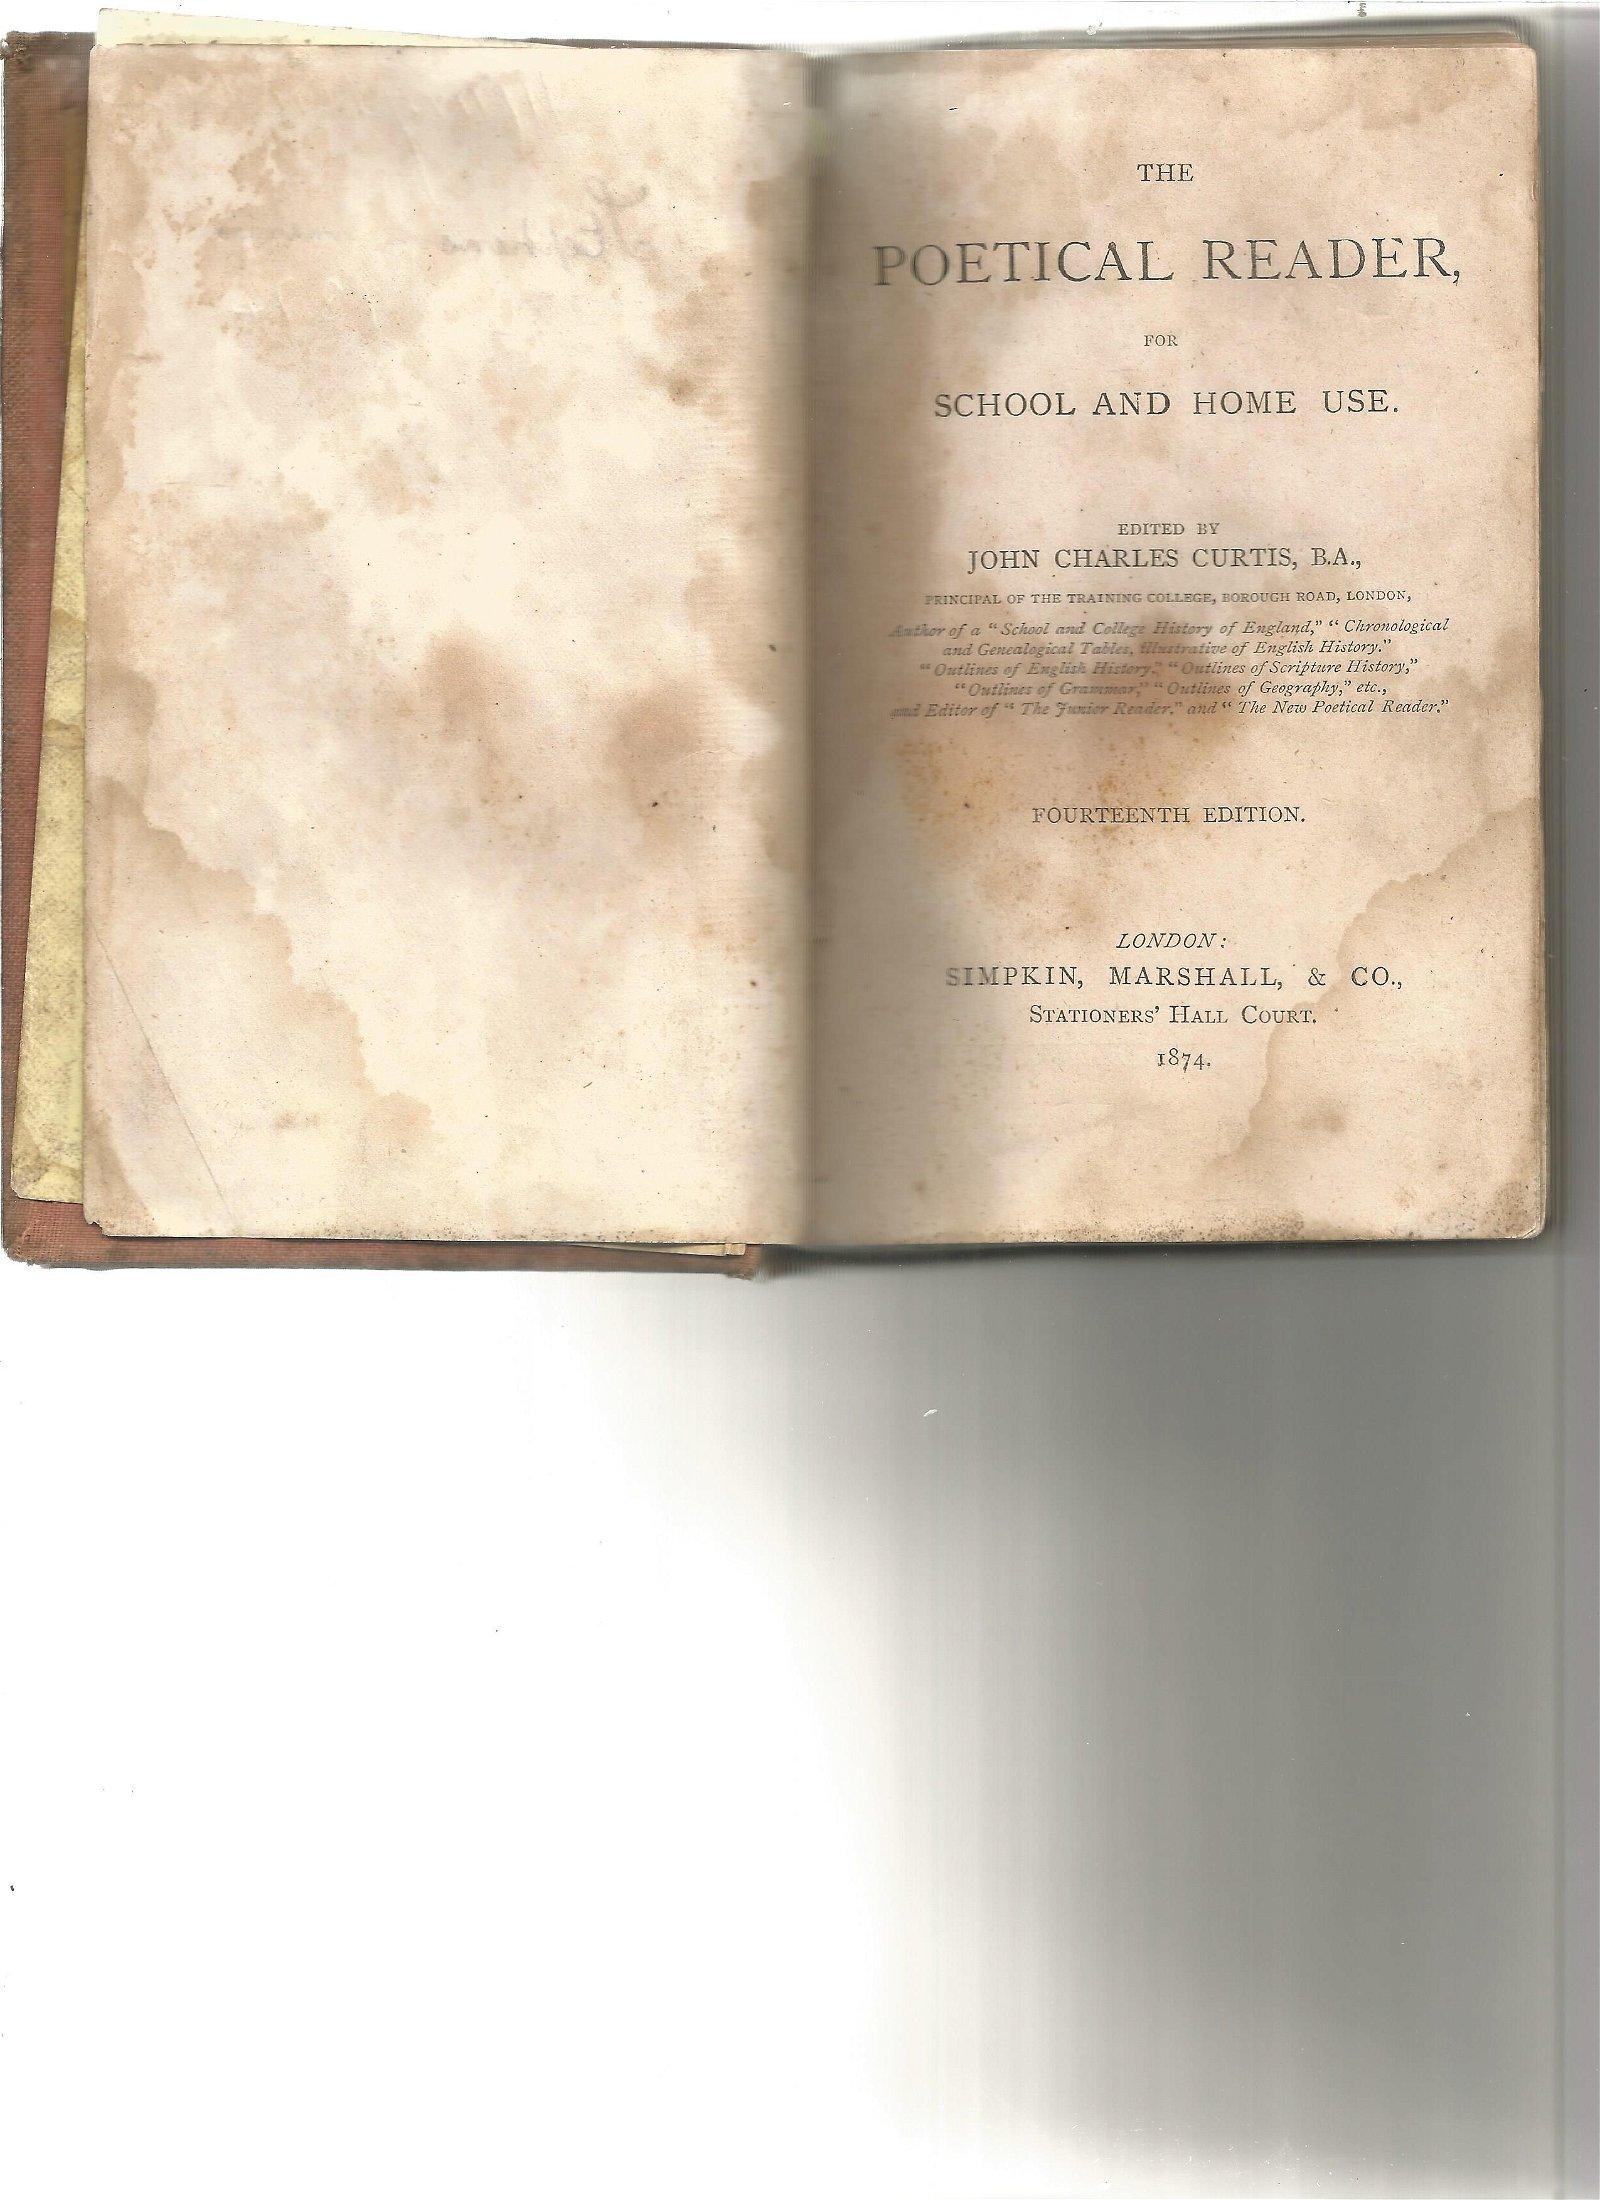 The Poetical Reader hardback book. Fourteenth edition.